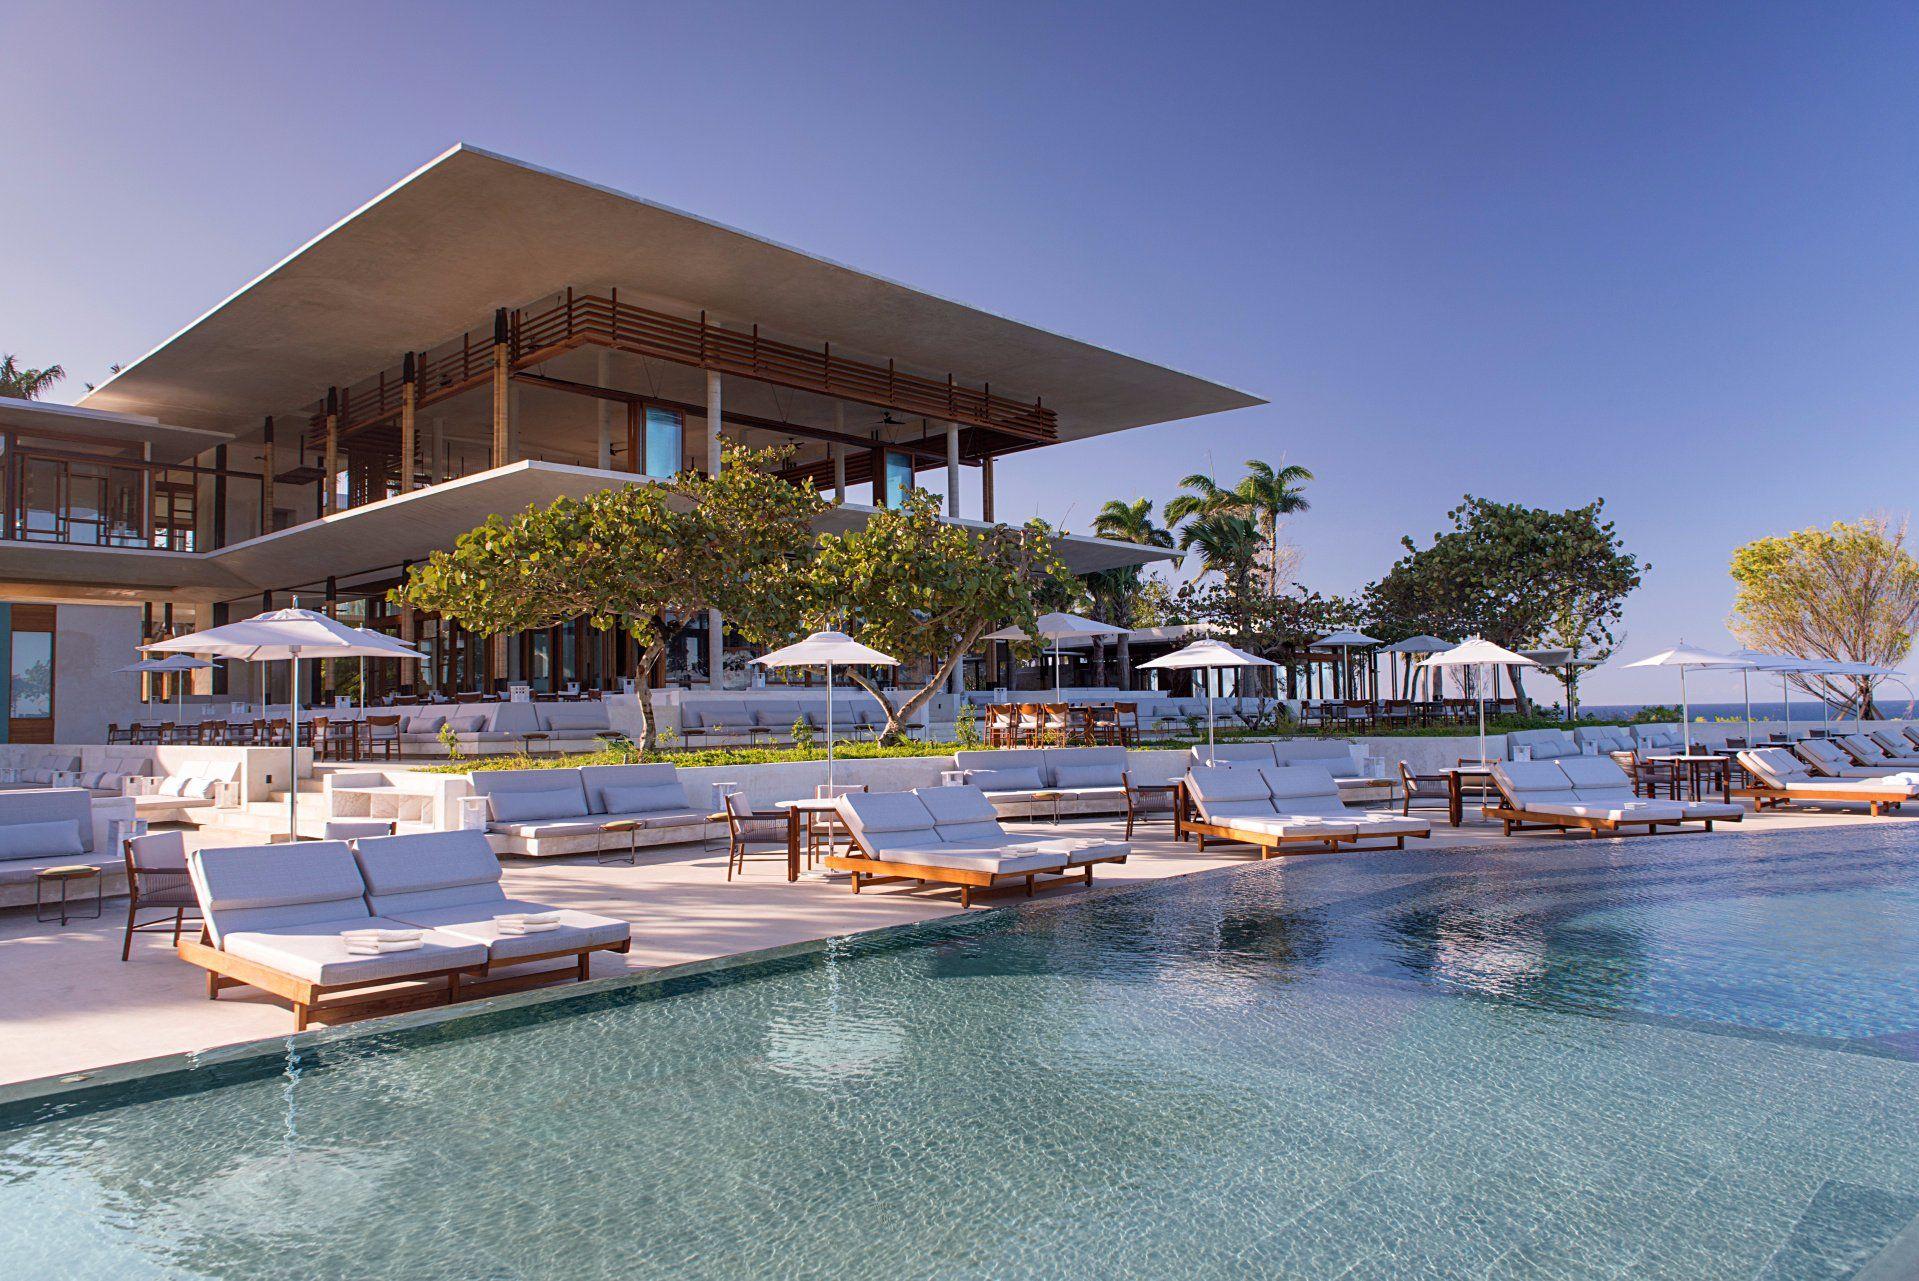 Amanera Updated 2018 Hotel Reviews Price Comparison And 159 Photos Rio San Juan Dominican Republic Tripadvisor